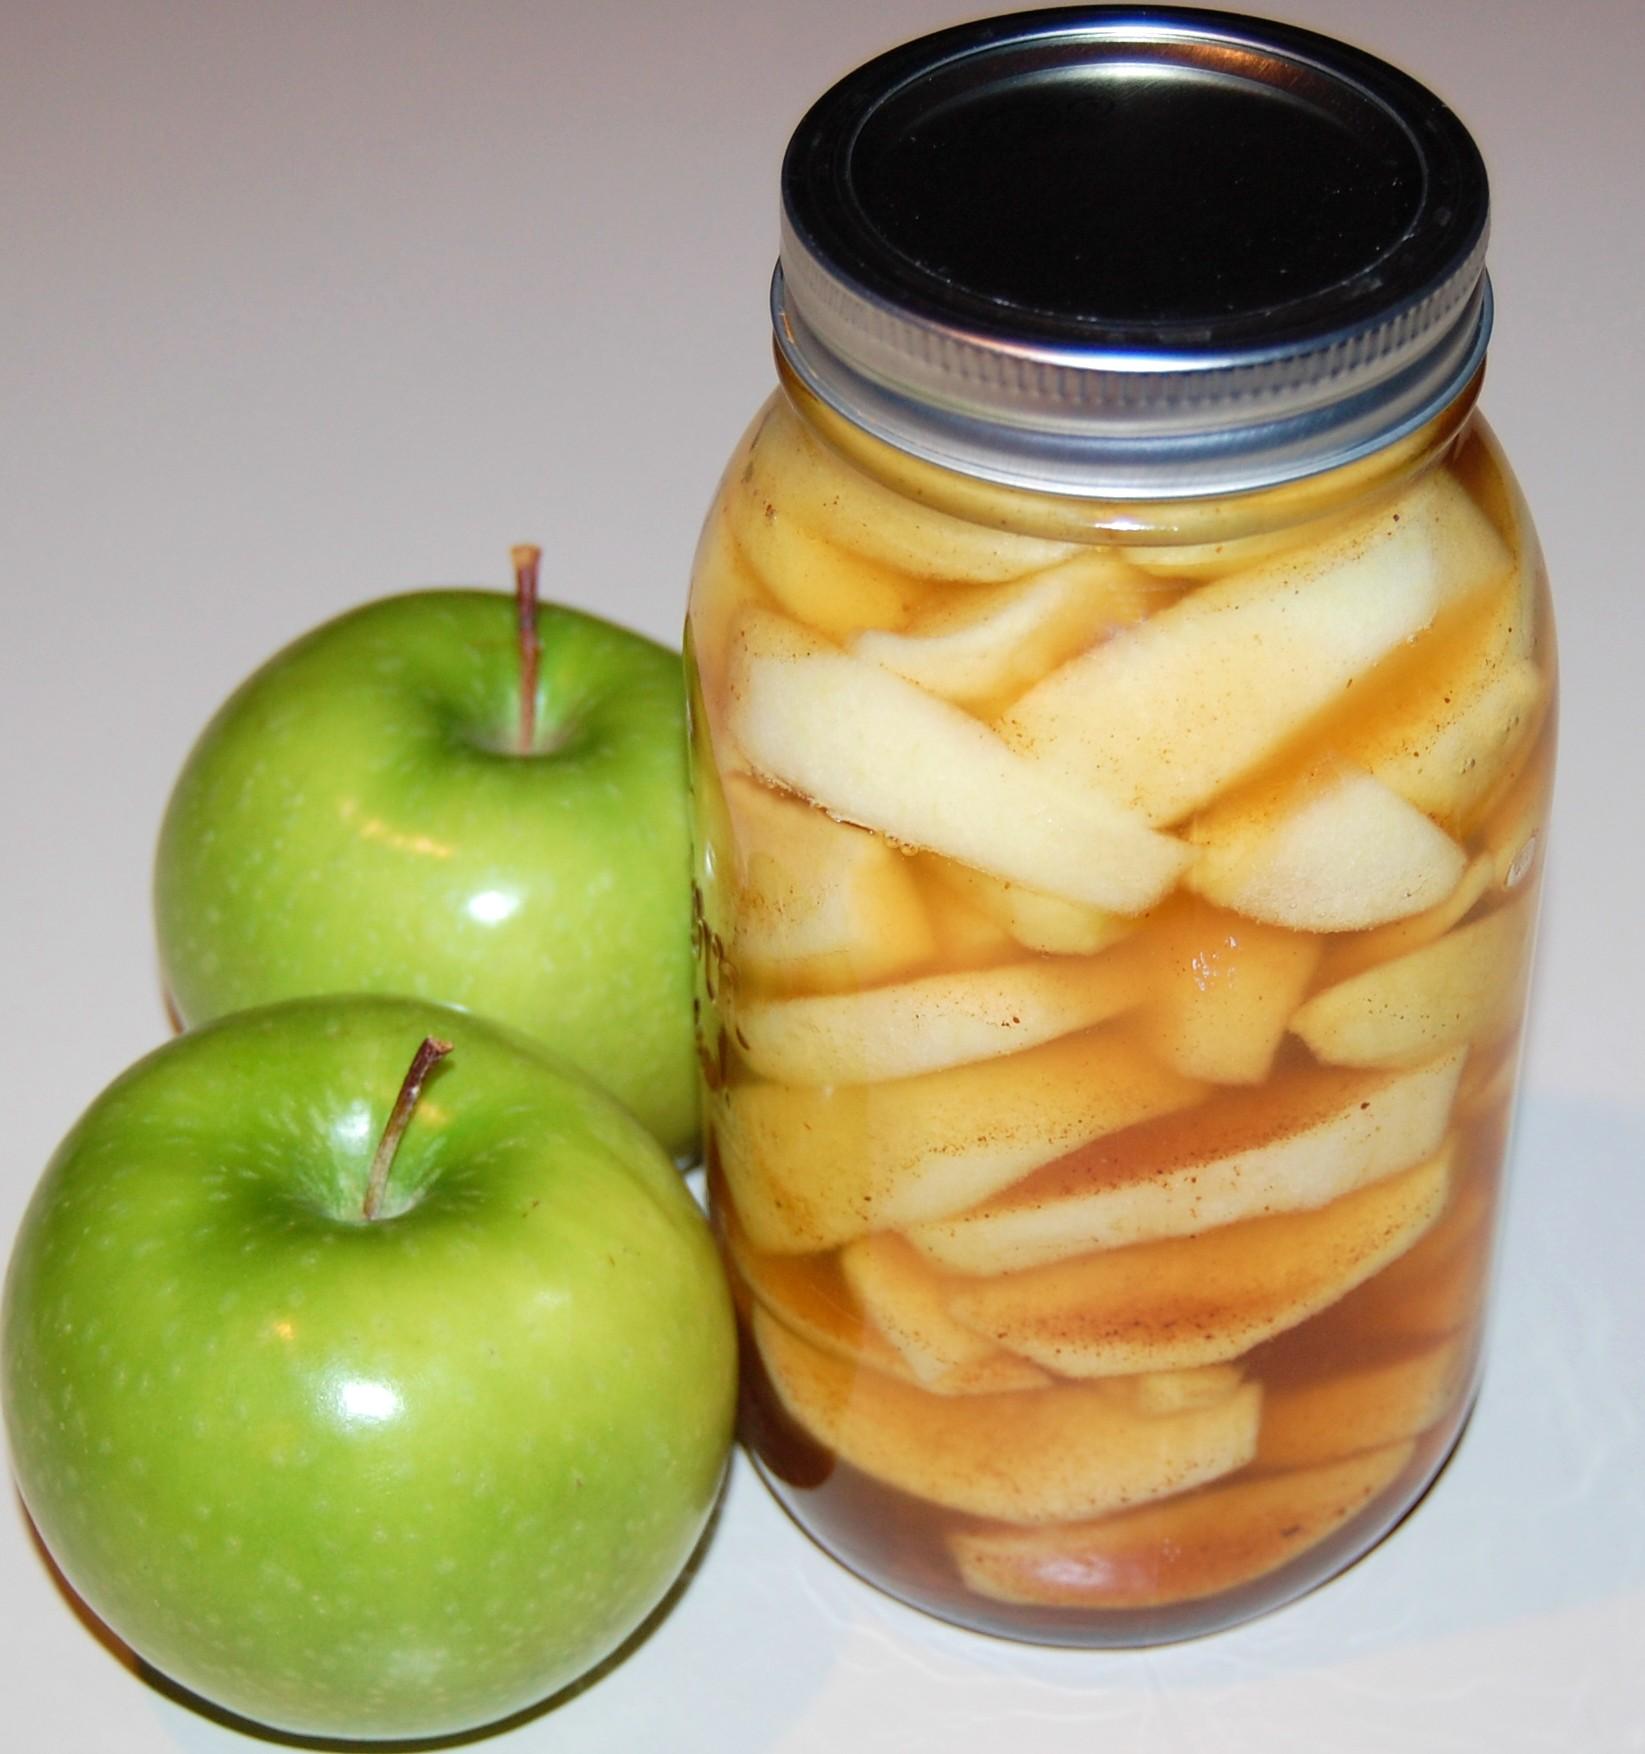 Apple Pie Filling & Crisp